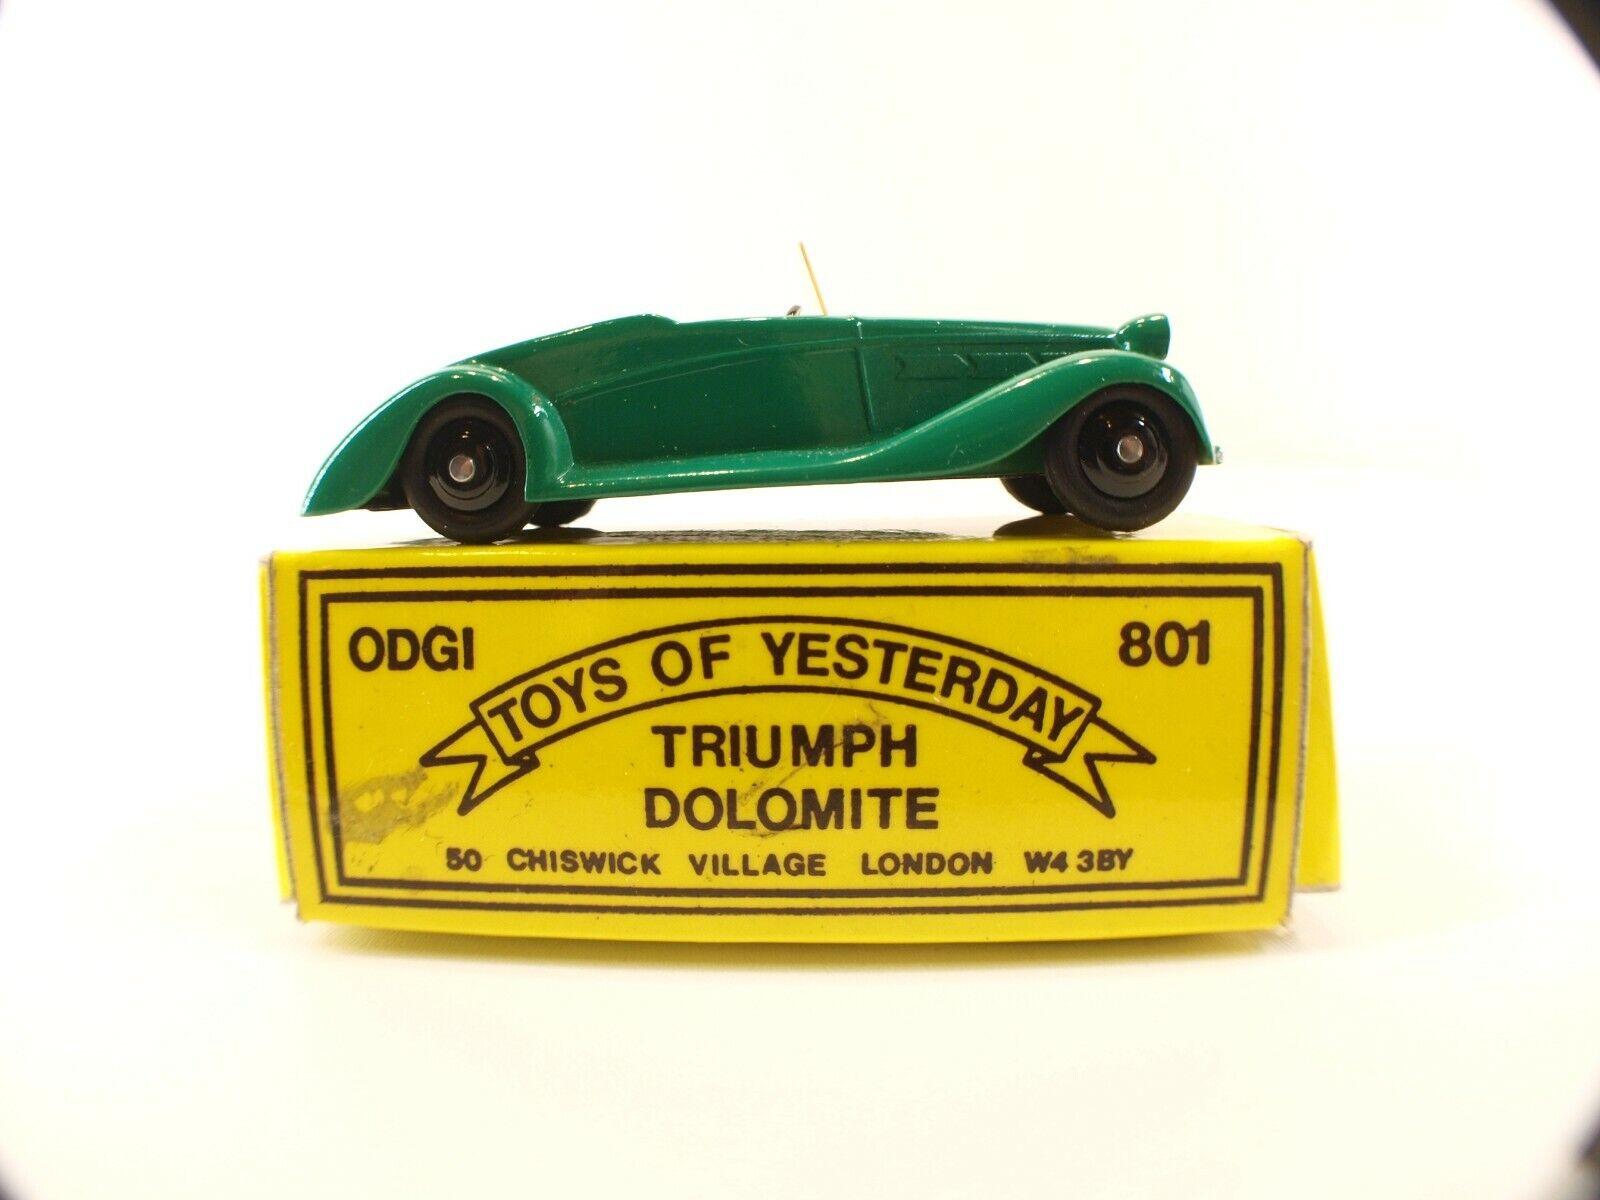 Odgi - 801 Triumph Dolomite - 9 cm  -  neuf en boite  de gros